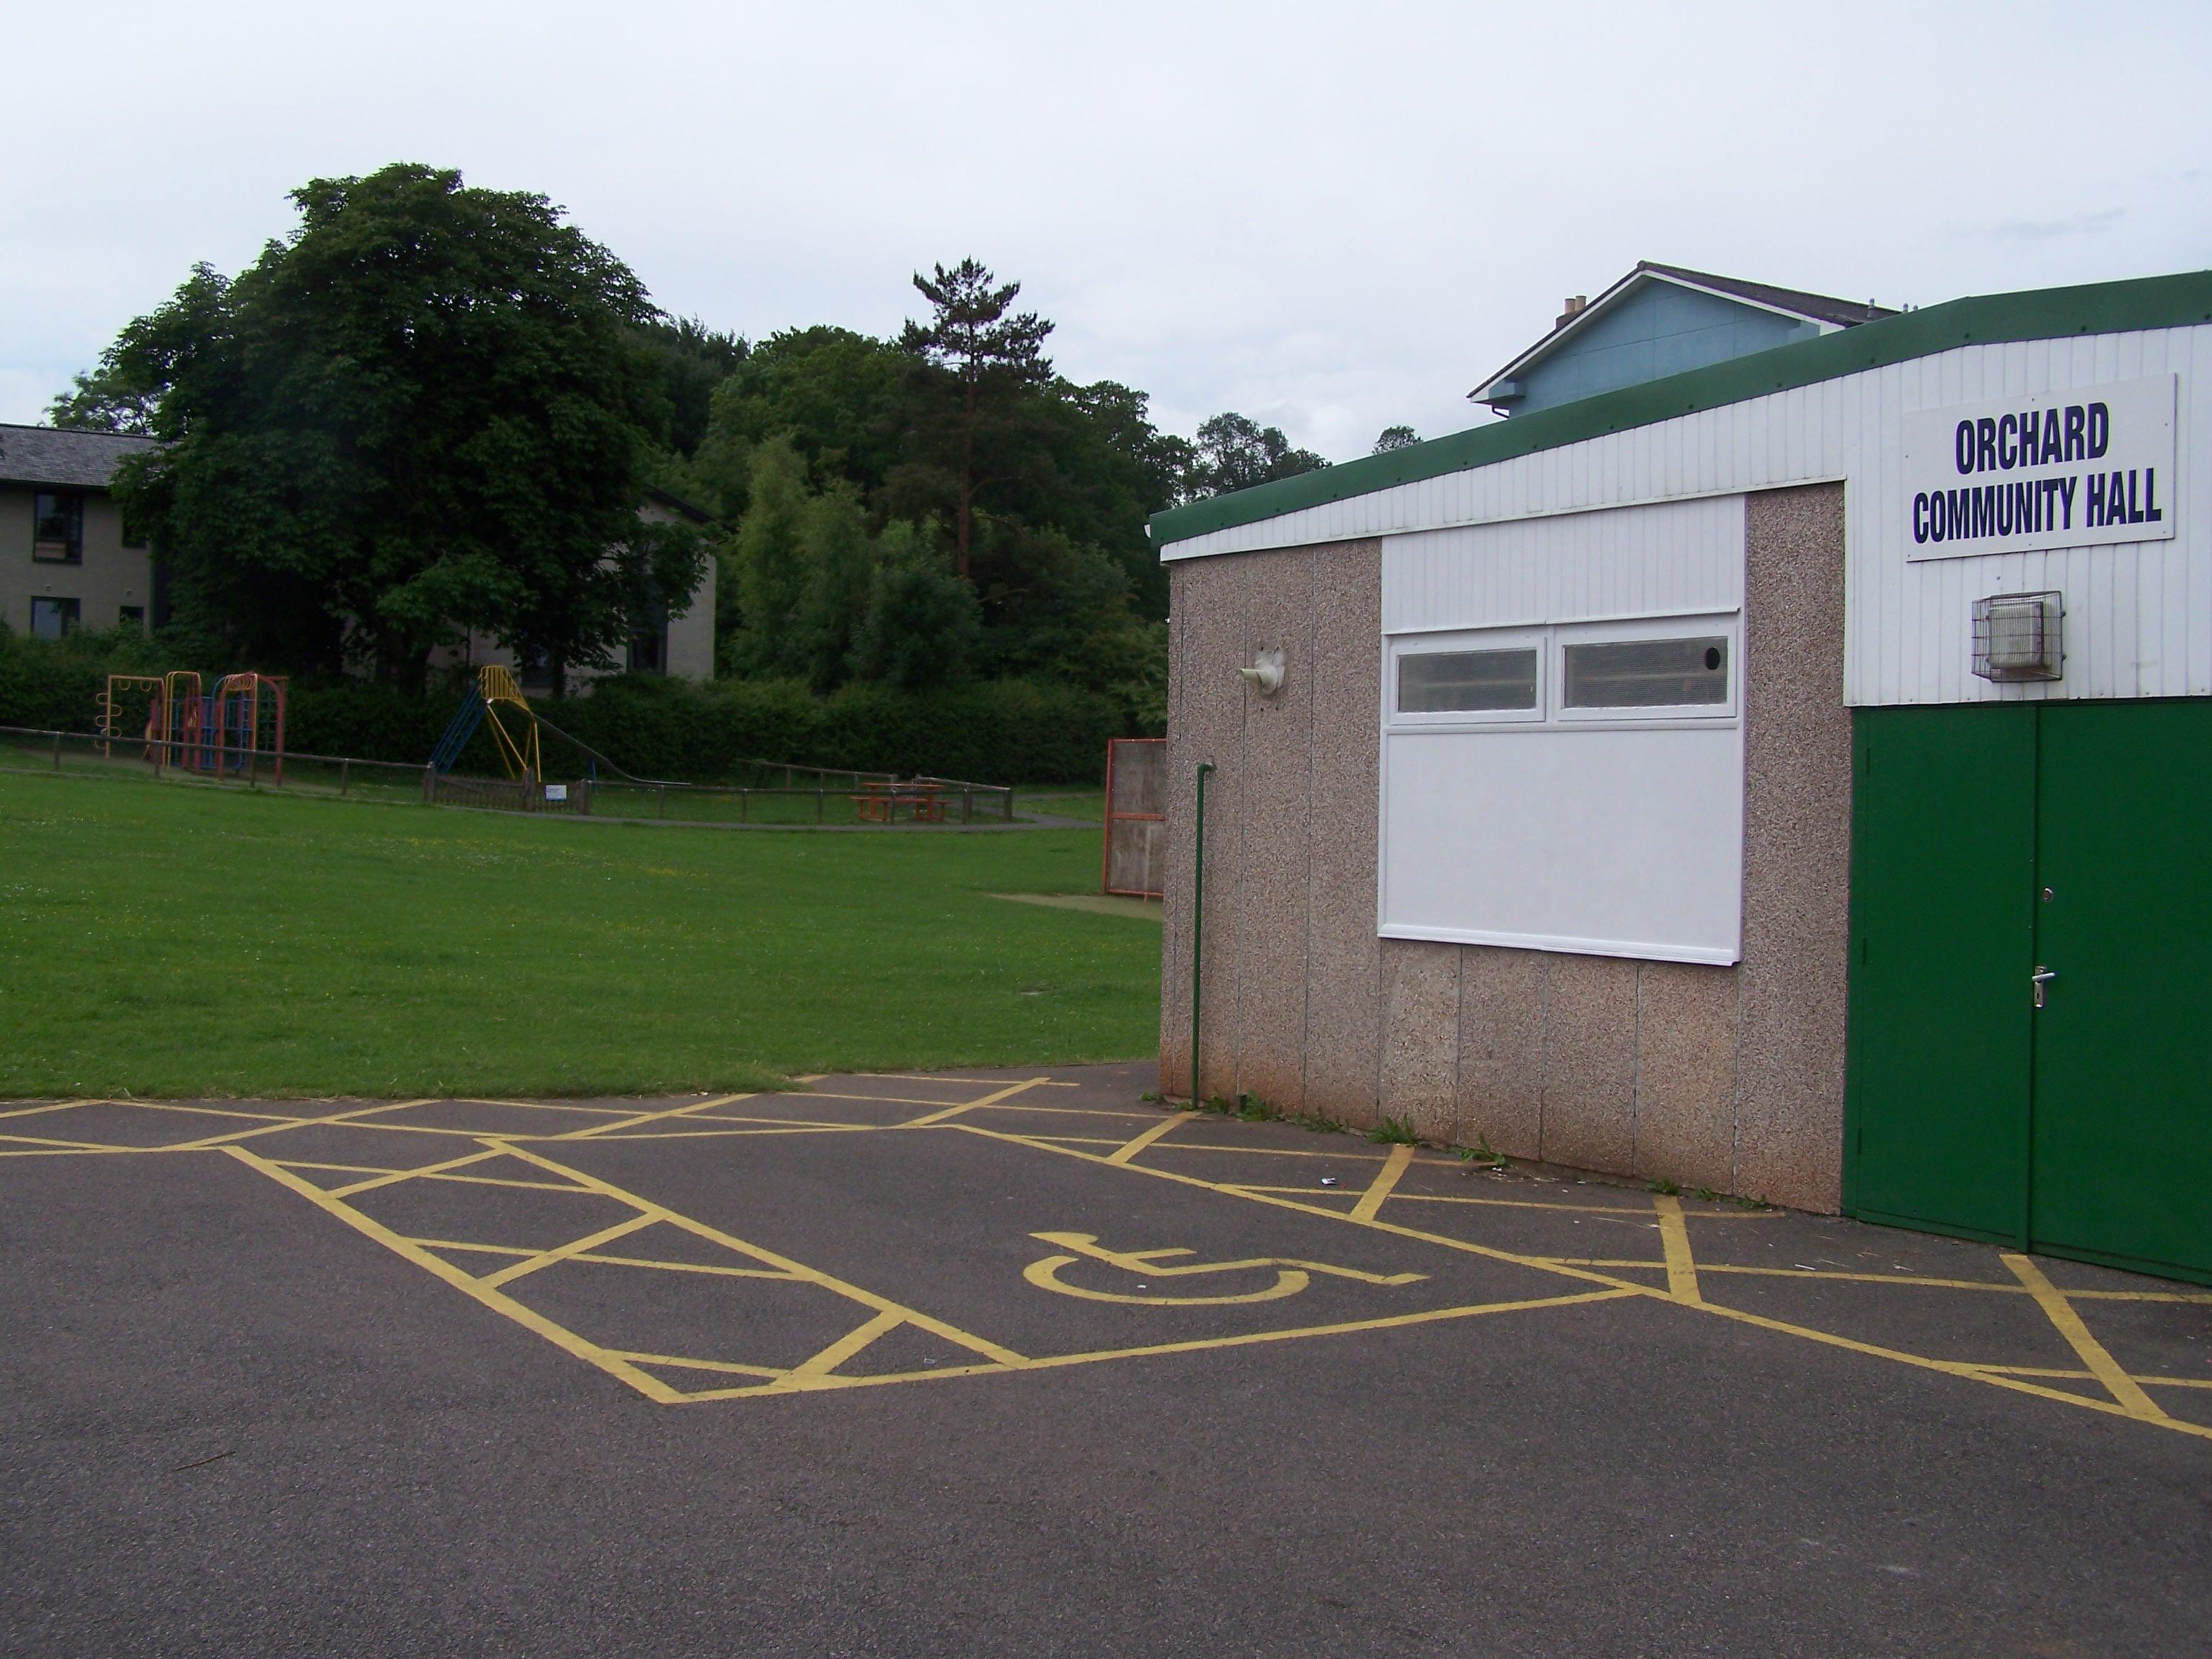 Orchard Community Hall Orchard Vale Longvernal Midsomer Norton BA3 2RB (01761) 419133